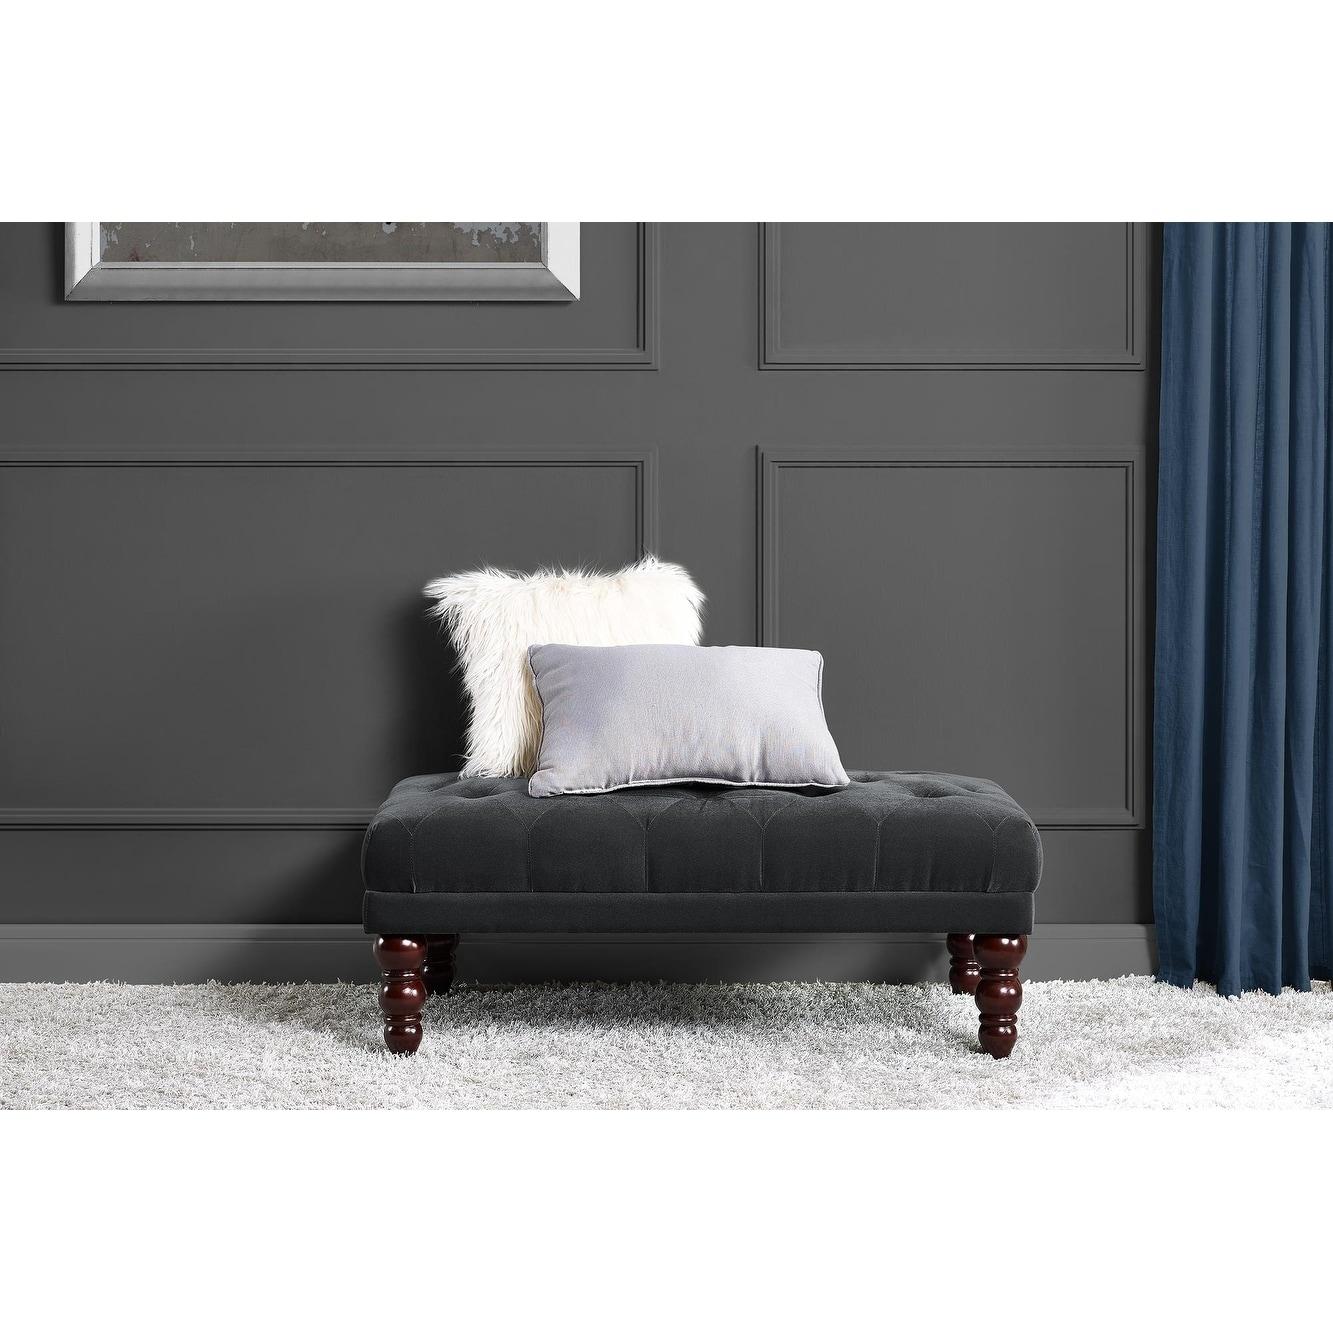 Pleasant Novogratz Vintage Tufted Ottoman Andrewgaddart Wooden Chair Designs For Living Room Andrewgaddartcom